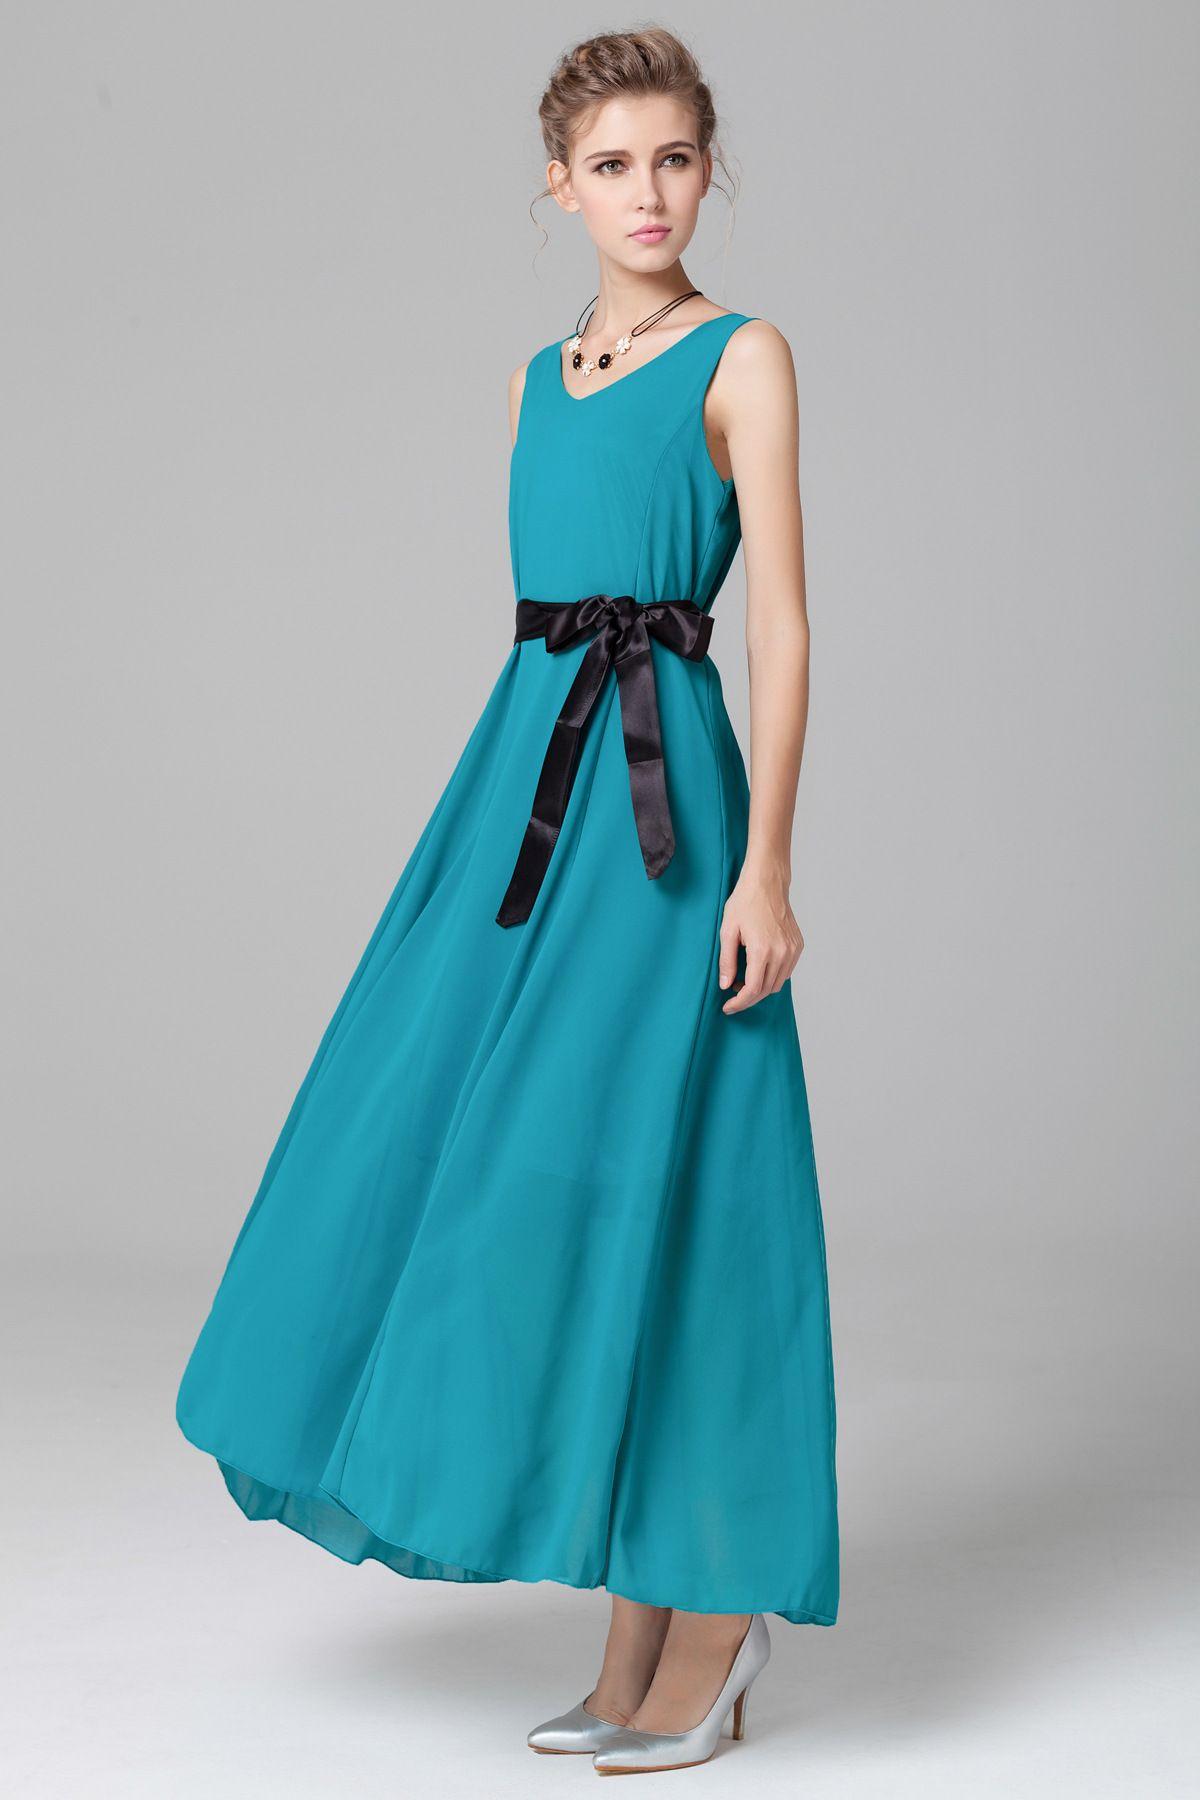 Ol D223 Elegant Events Summer Ladies Dress Sleeveless Ribbon V Neck ...